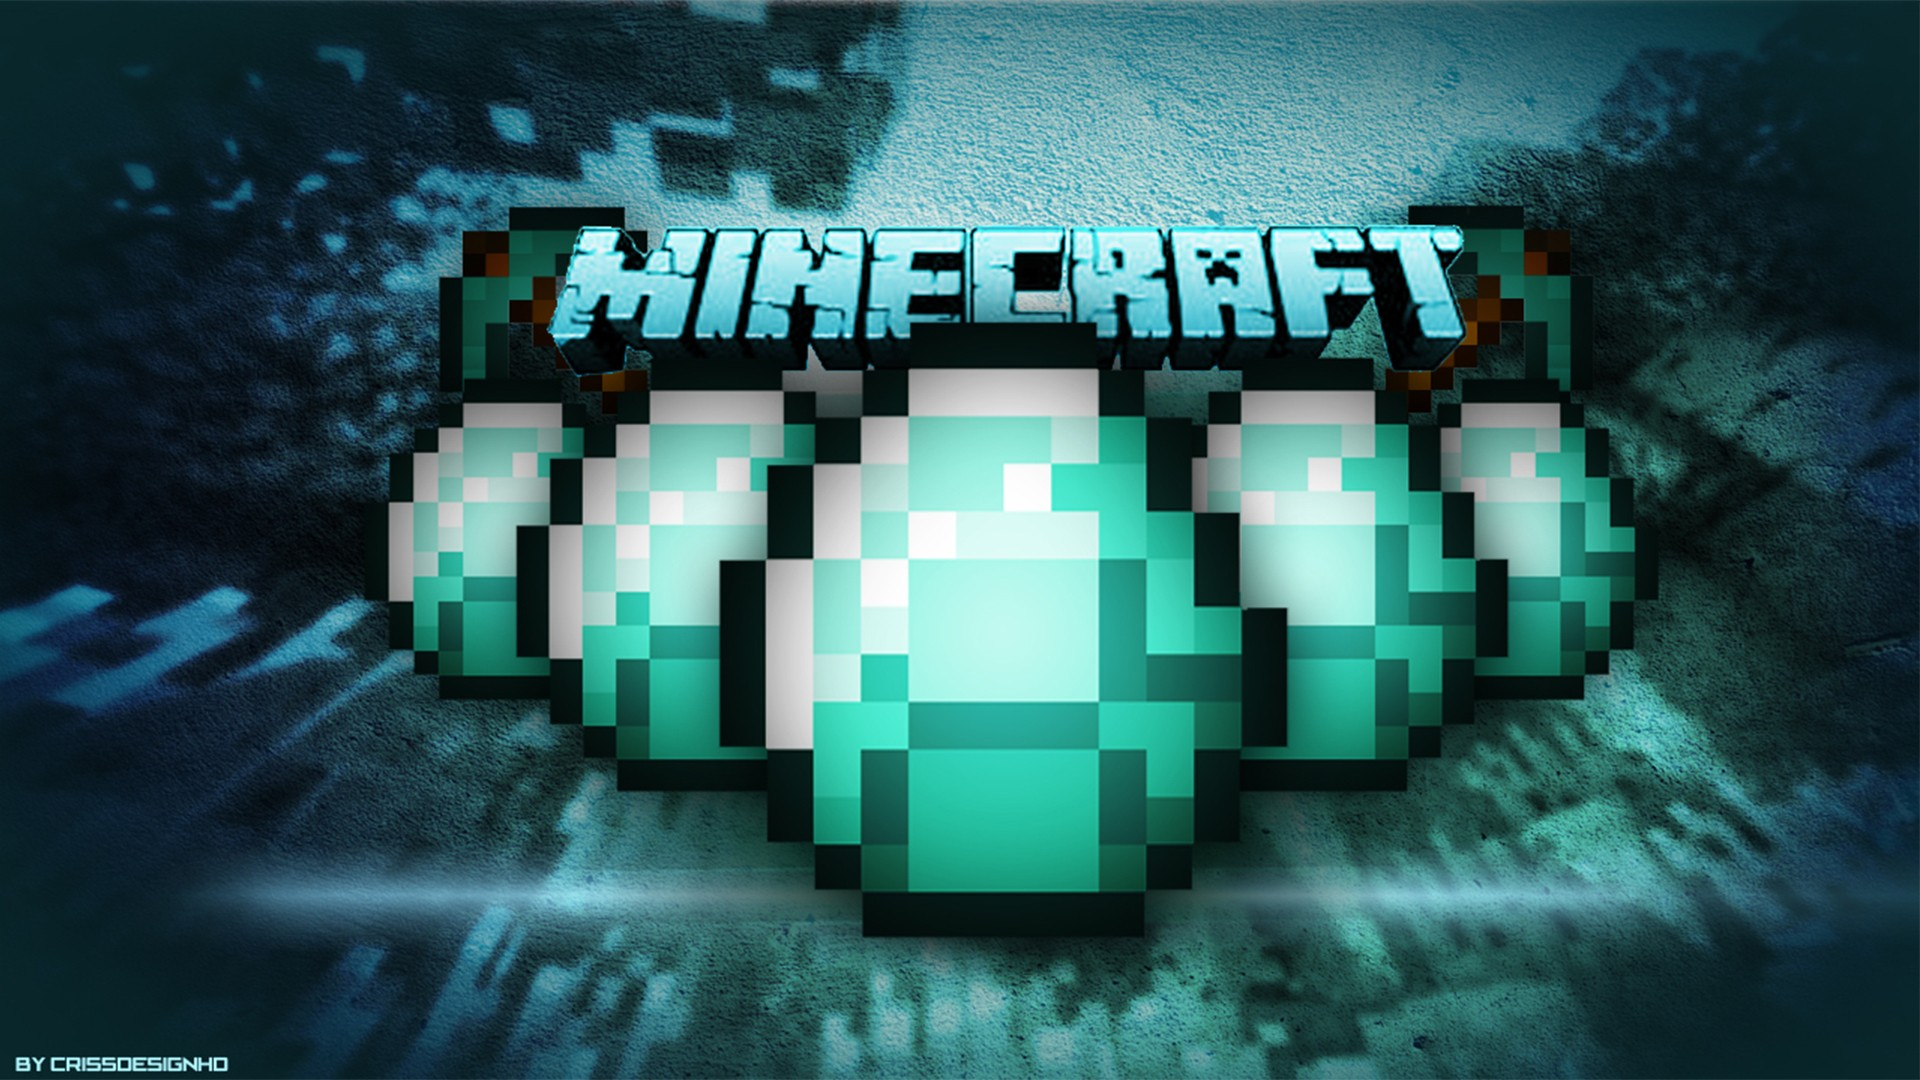 free download minecraft diamond sword make pixel art hd wallpaper Car 1920x1080